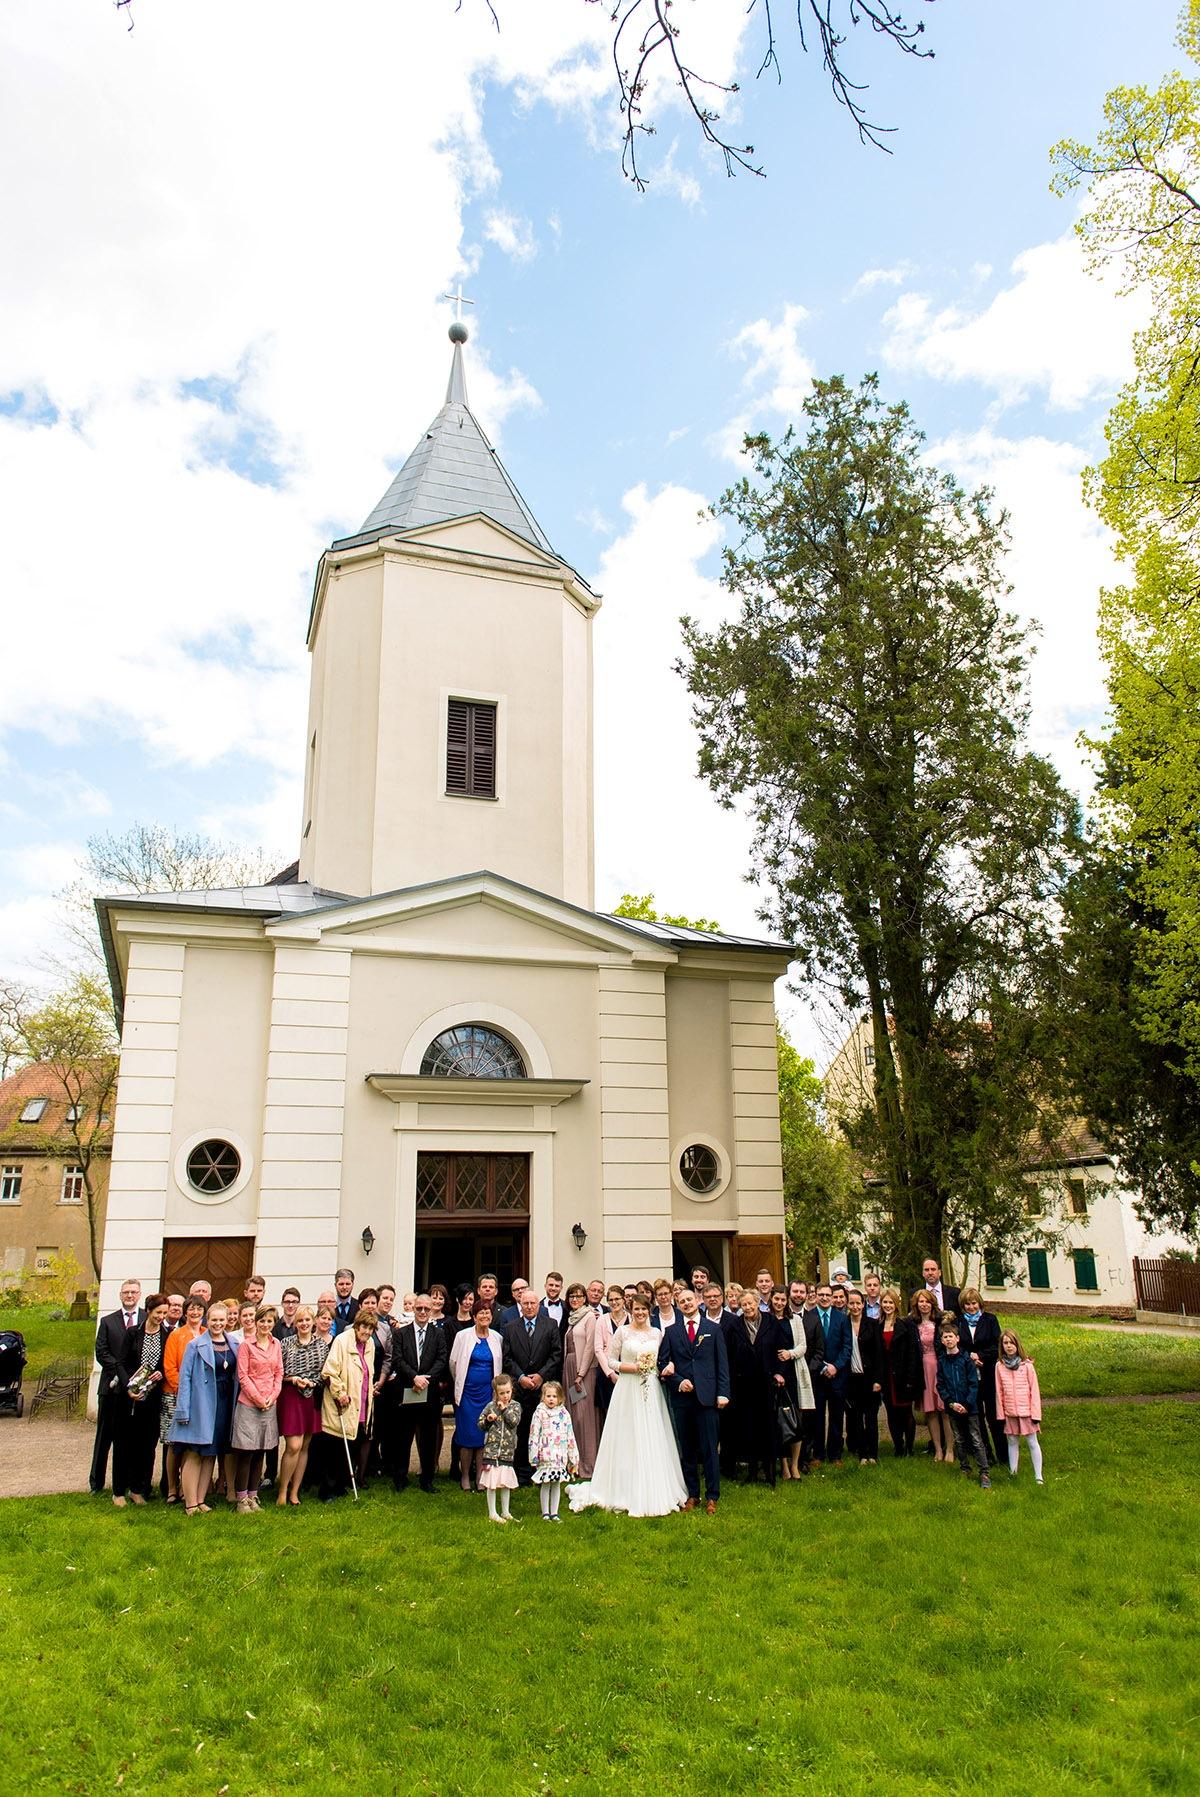 Immanuelkirche Probstheida